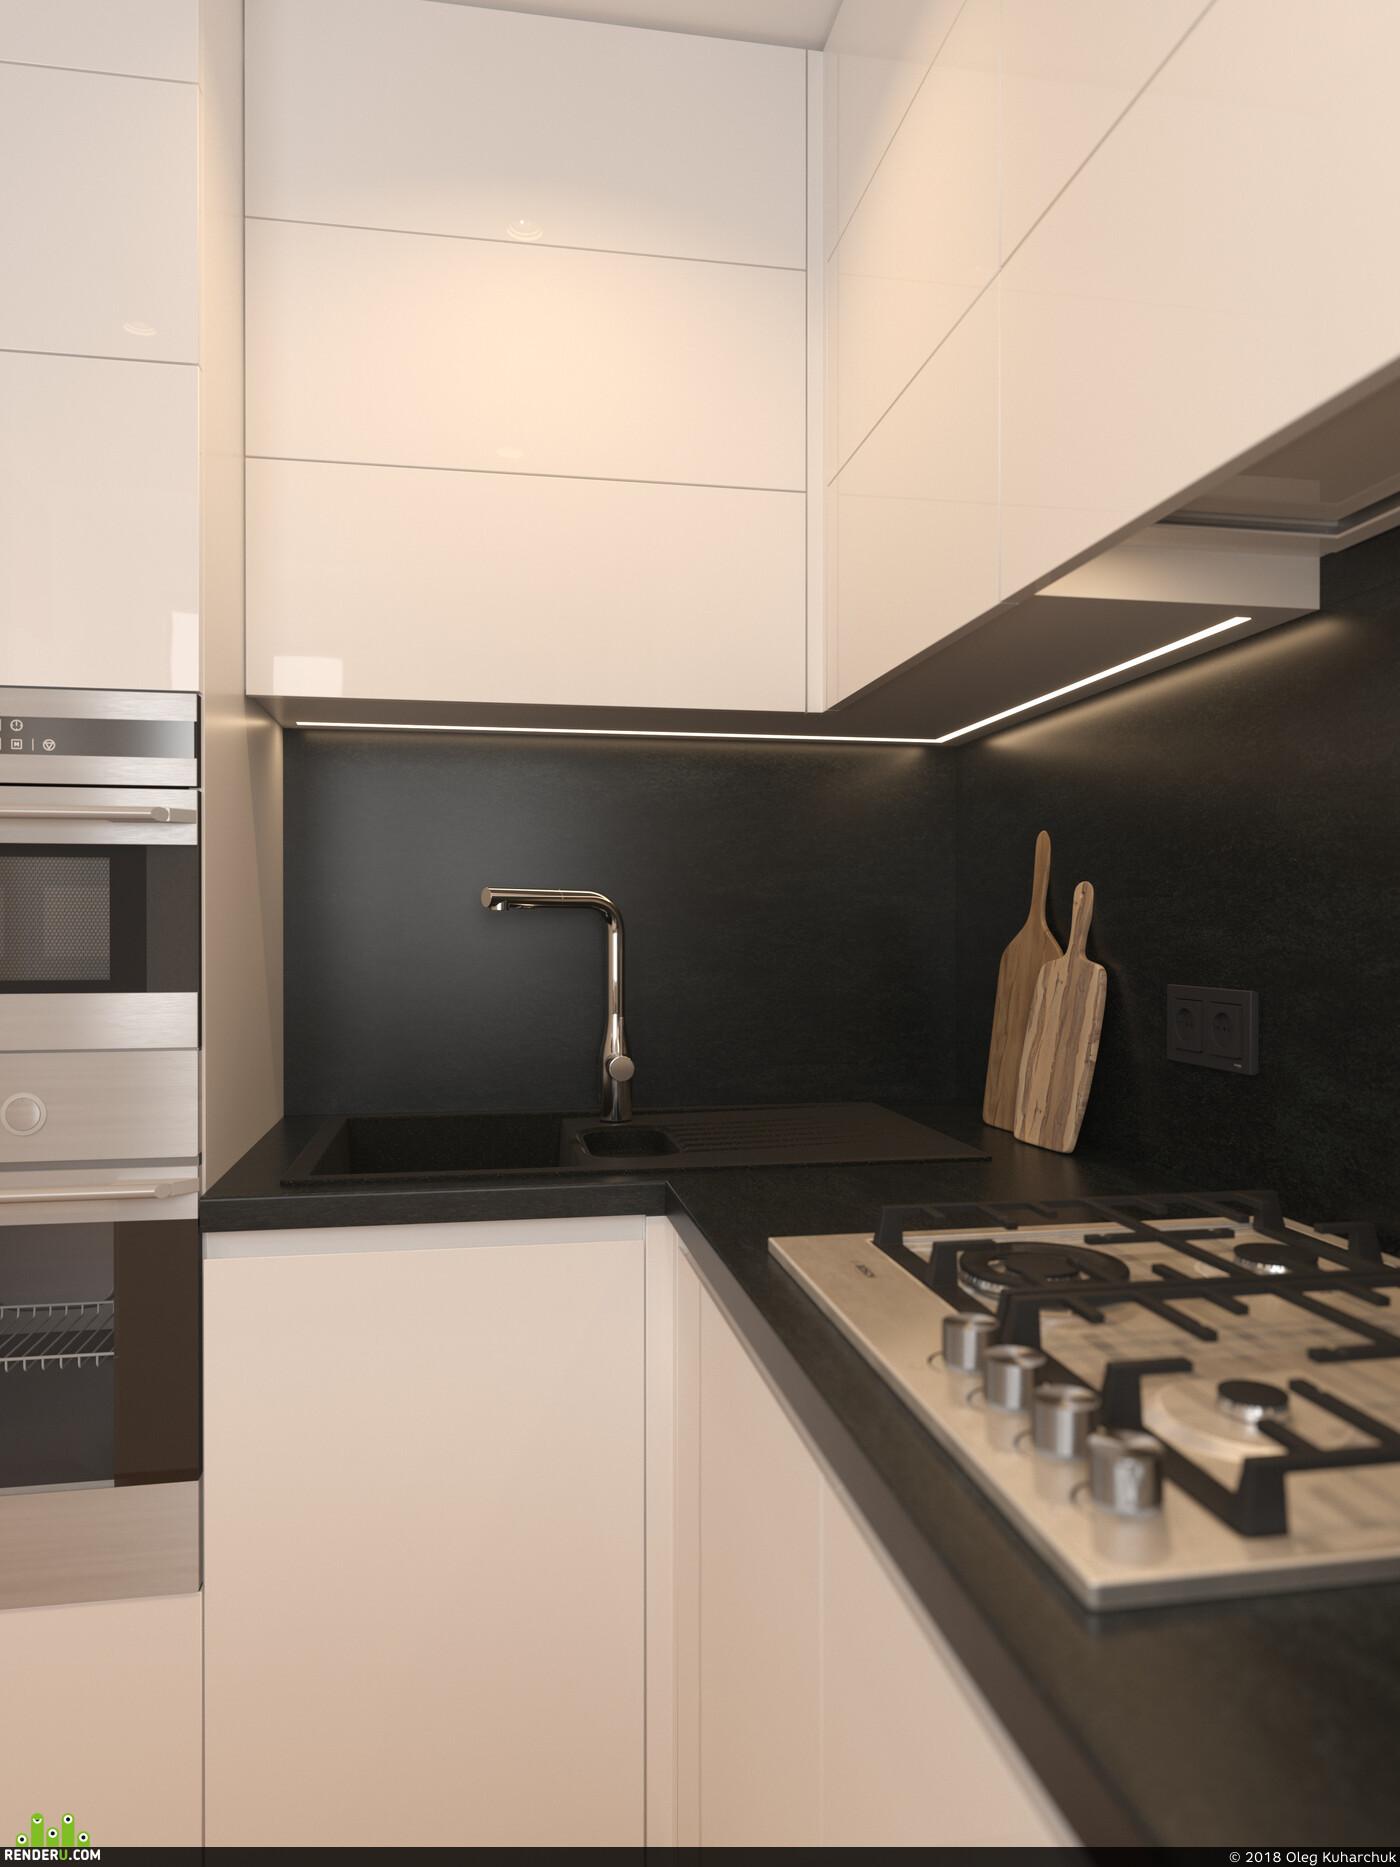 дизайн, дизайн интерьера, дизайн кухни, кухня, глянец, шпон дуба, дуб